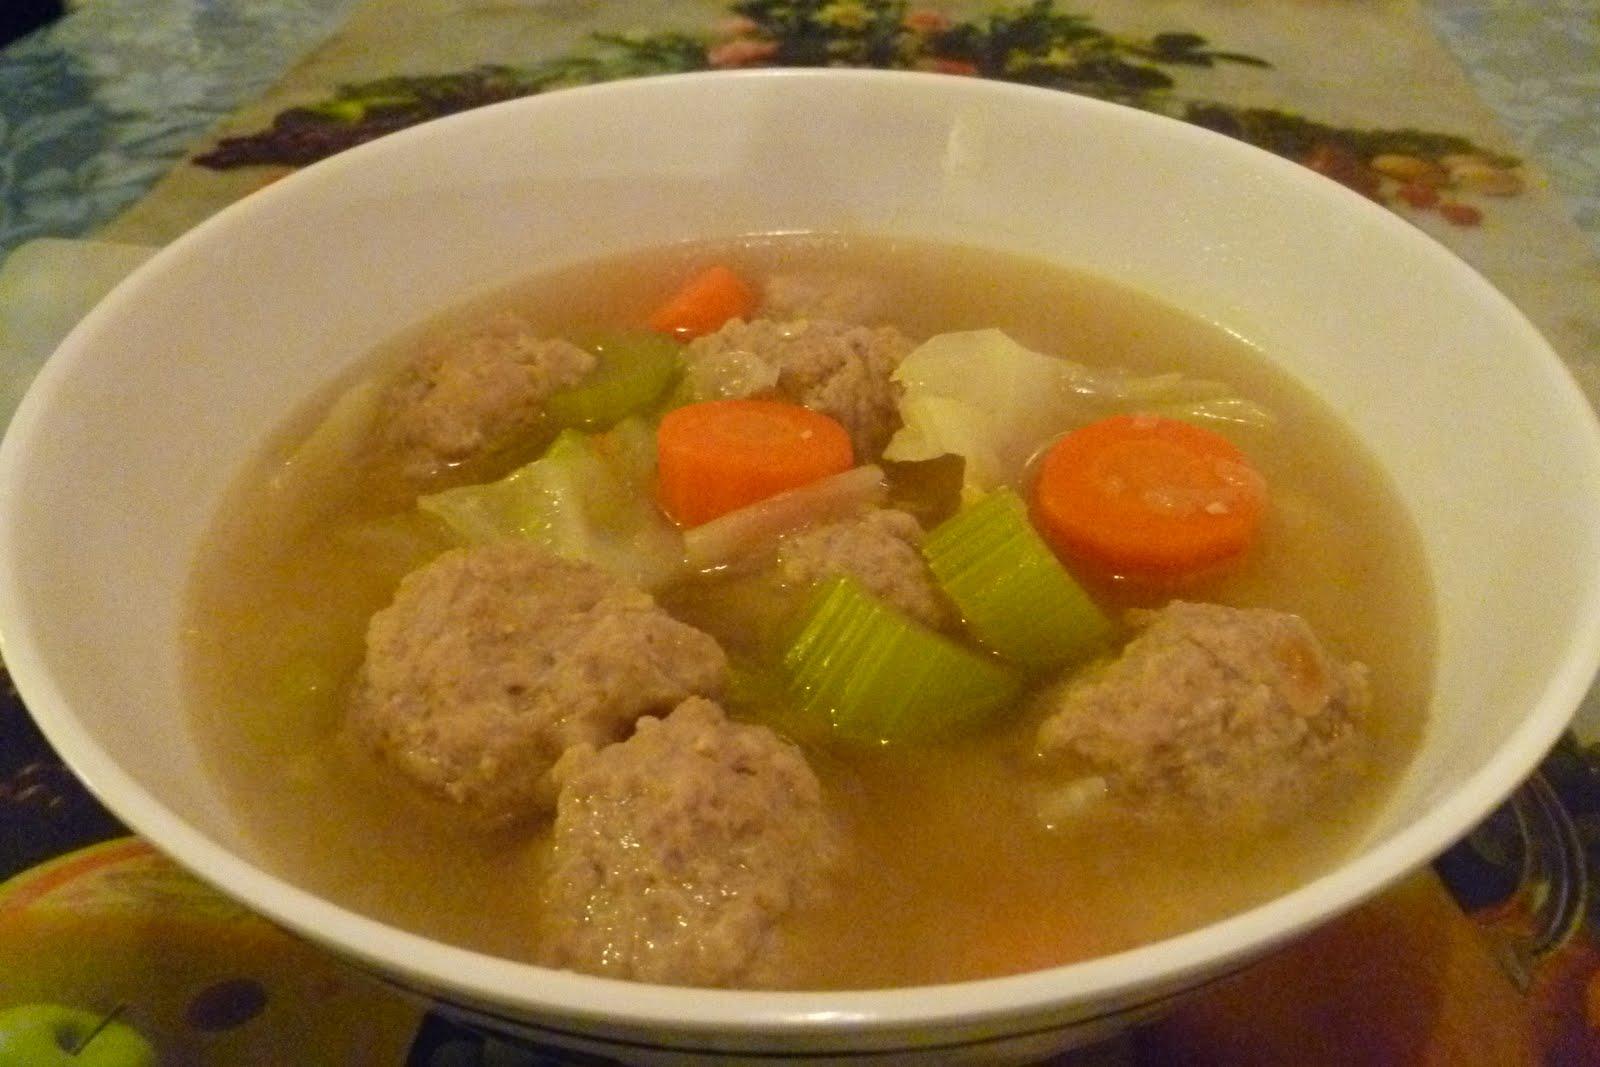 resep masakan sup bakso ayam